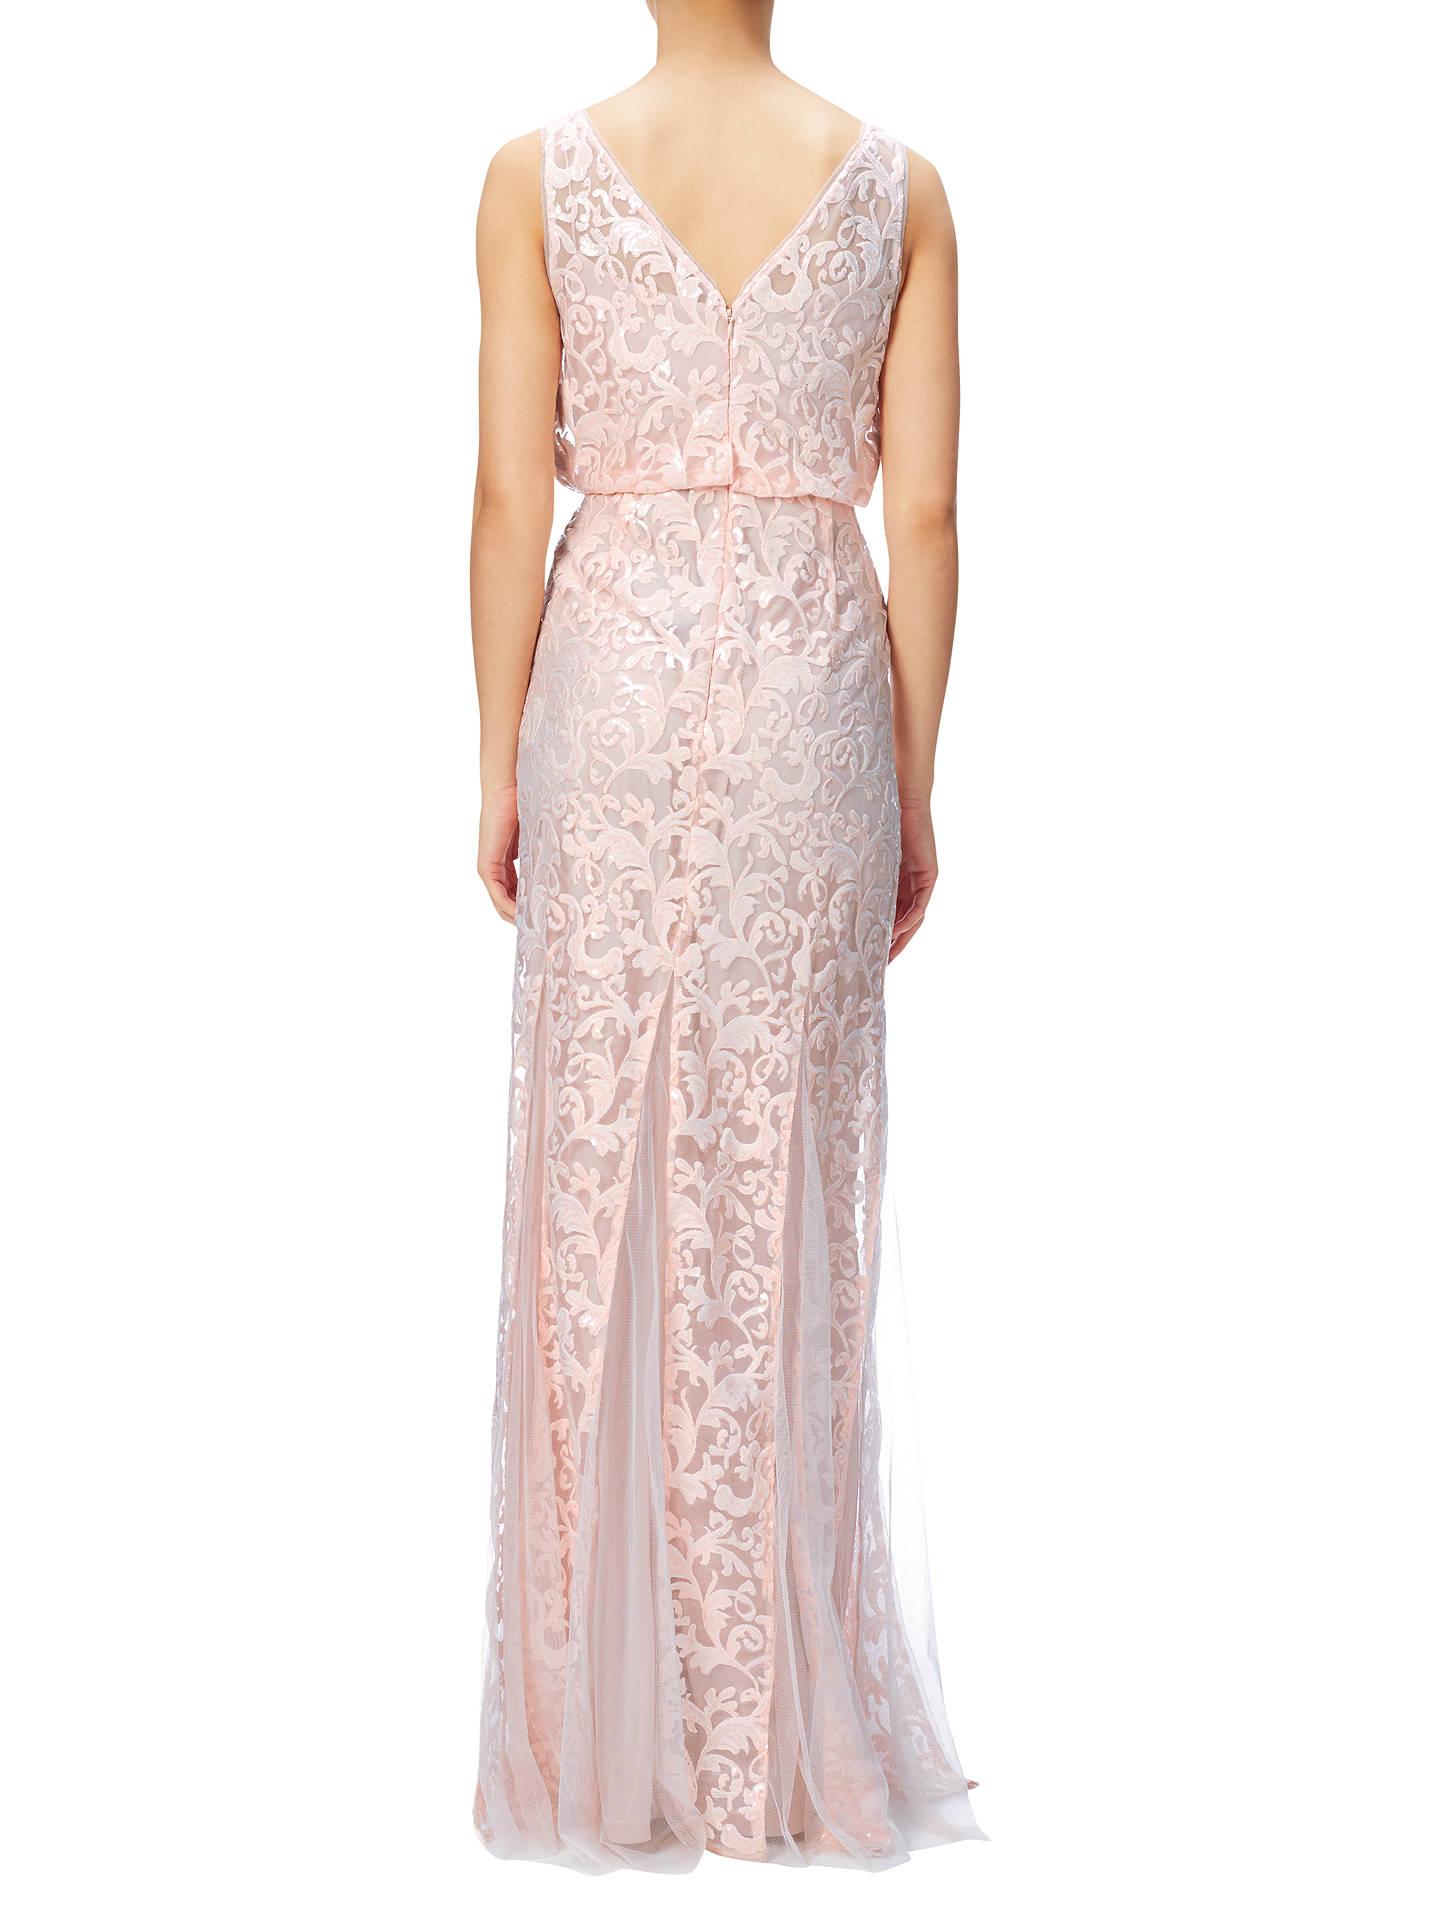 Adrianna Papell Sequin Mesh Blouson Mermaid Dress, Blush ...